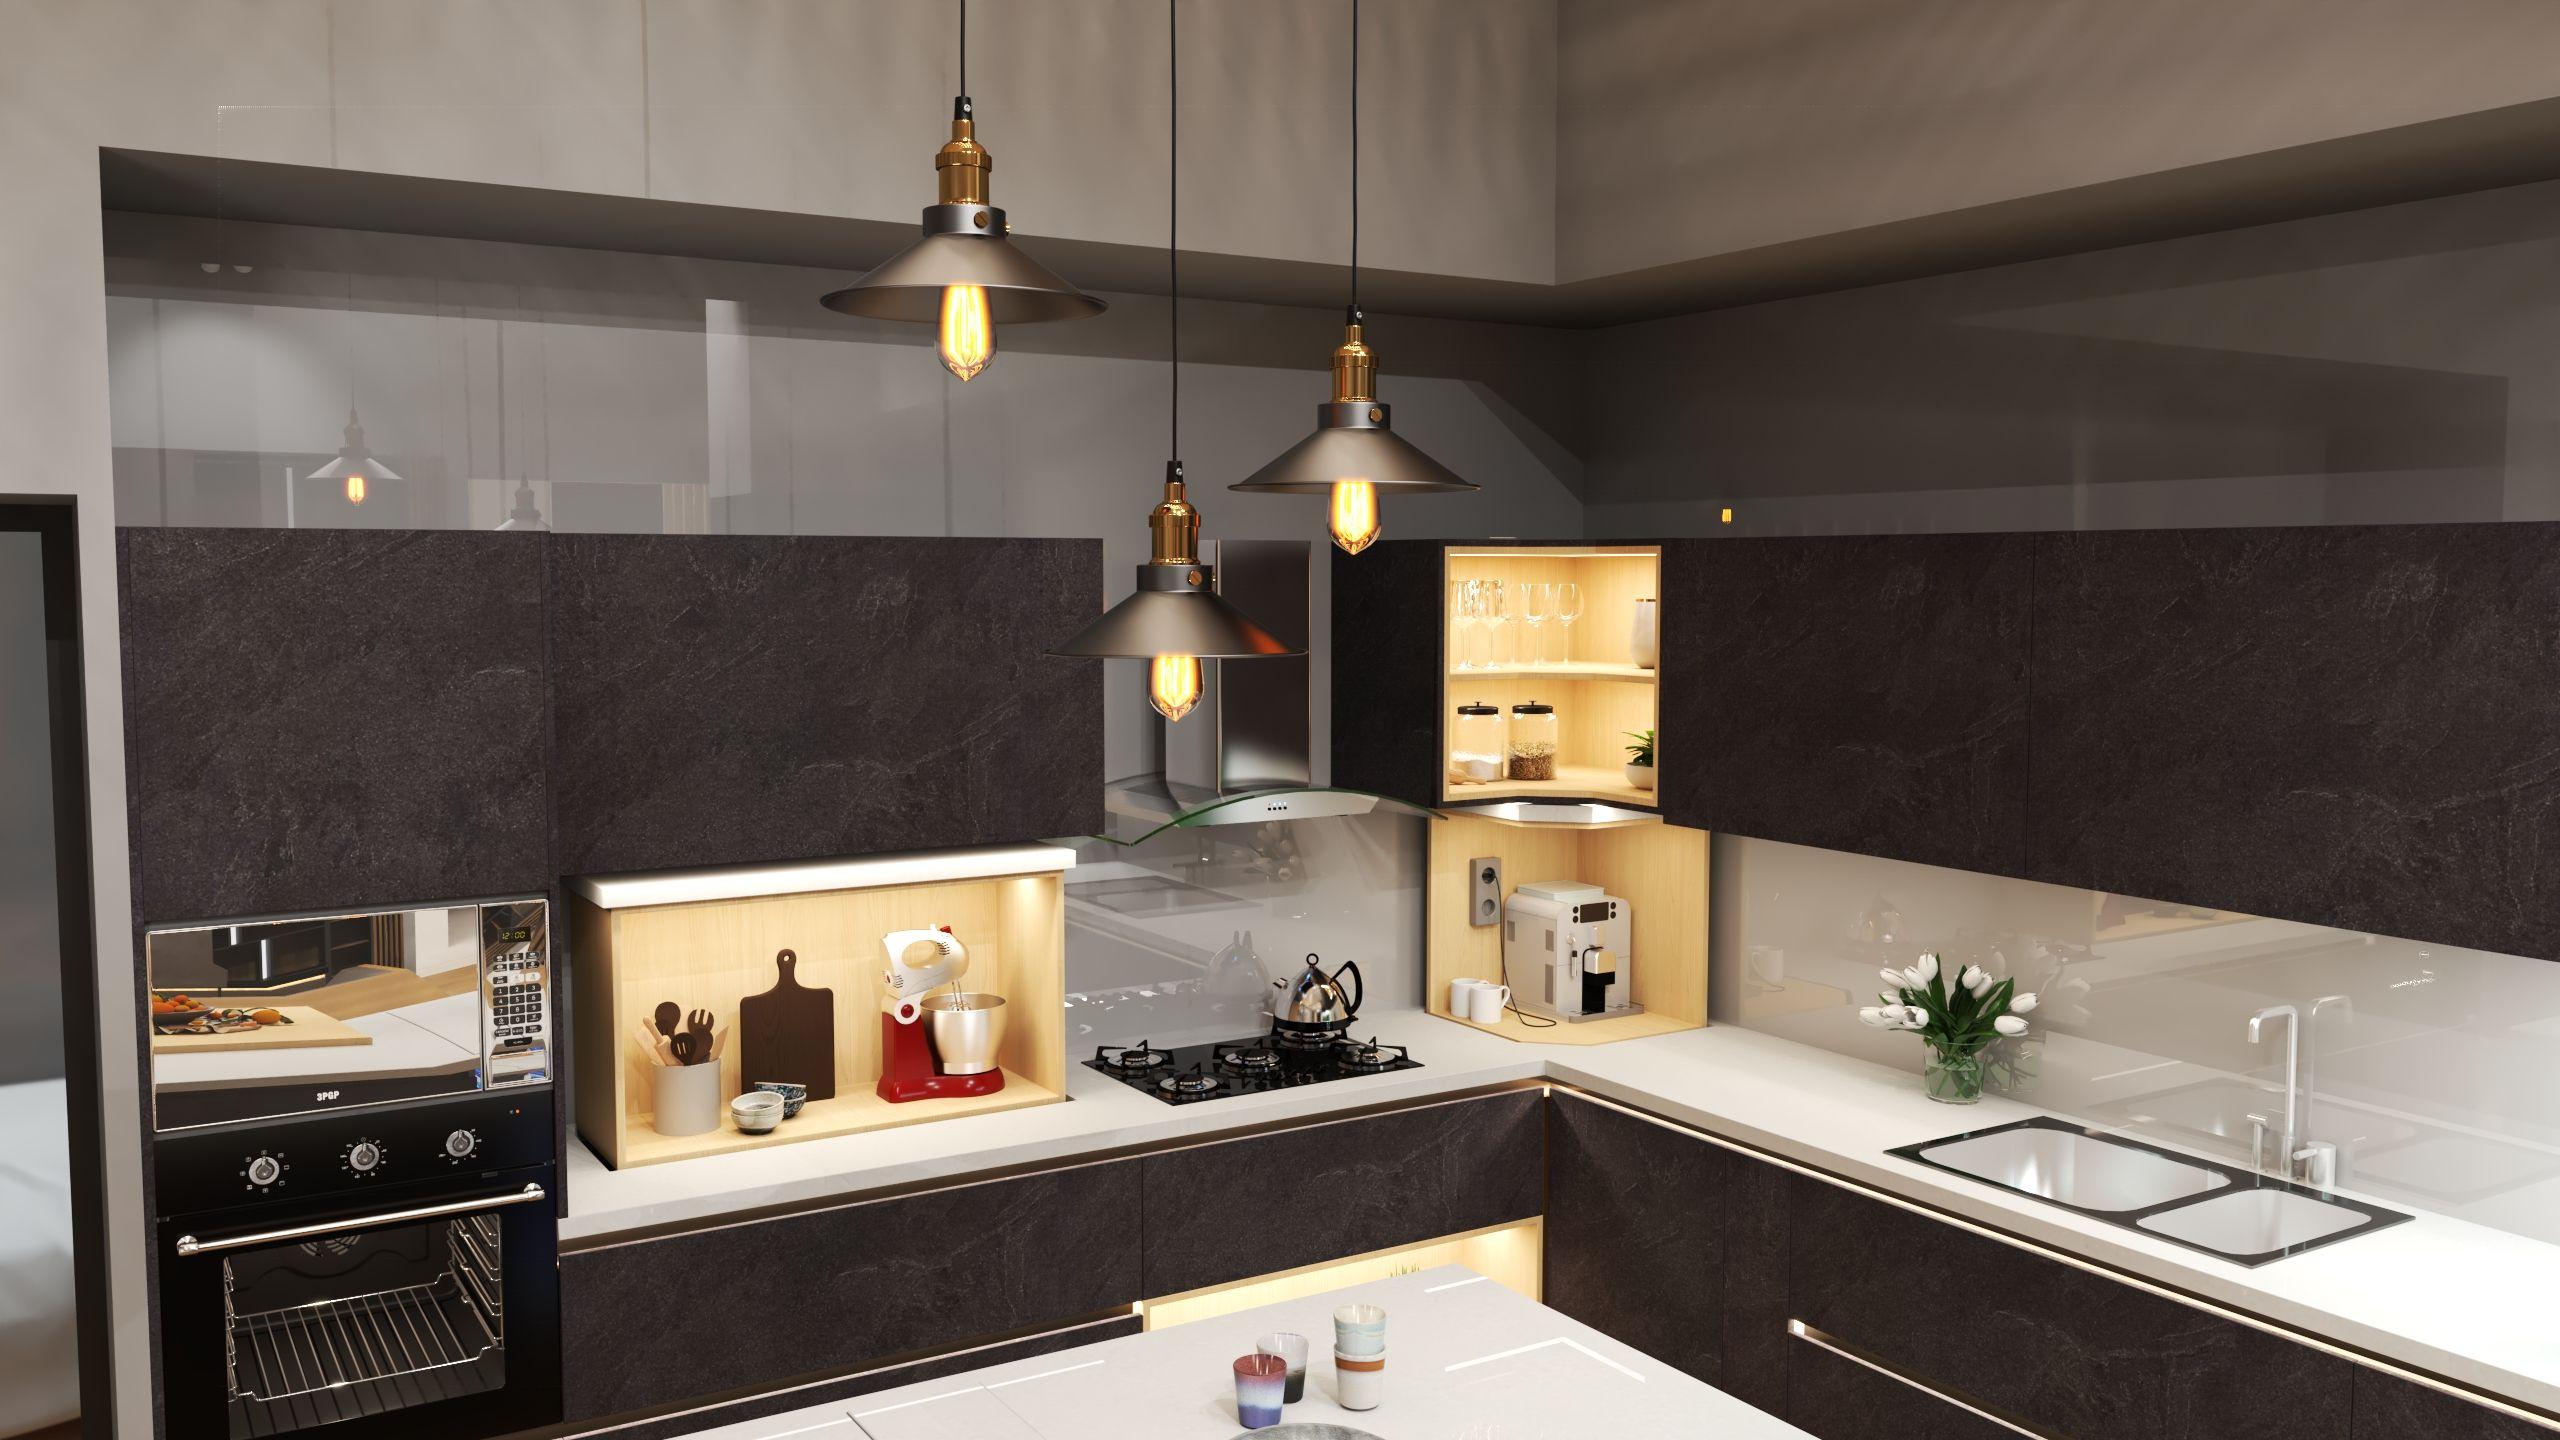 Kitchen design for @idf 7 #interiordesignexpo in #muscat #oman